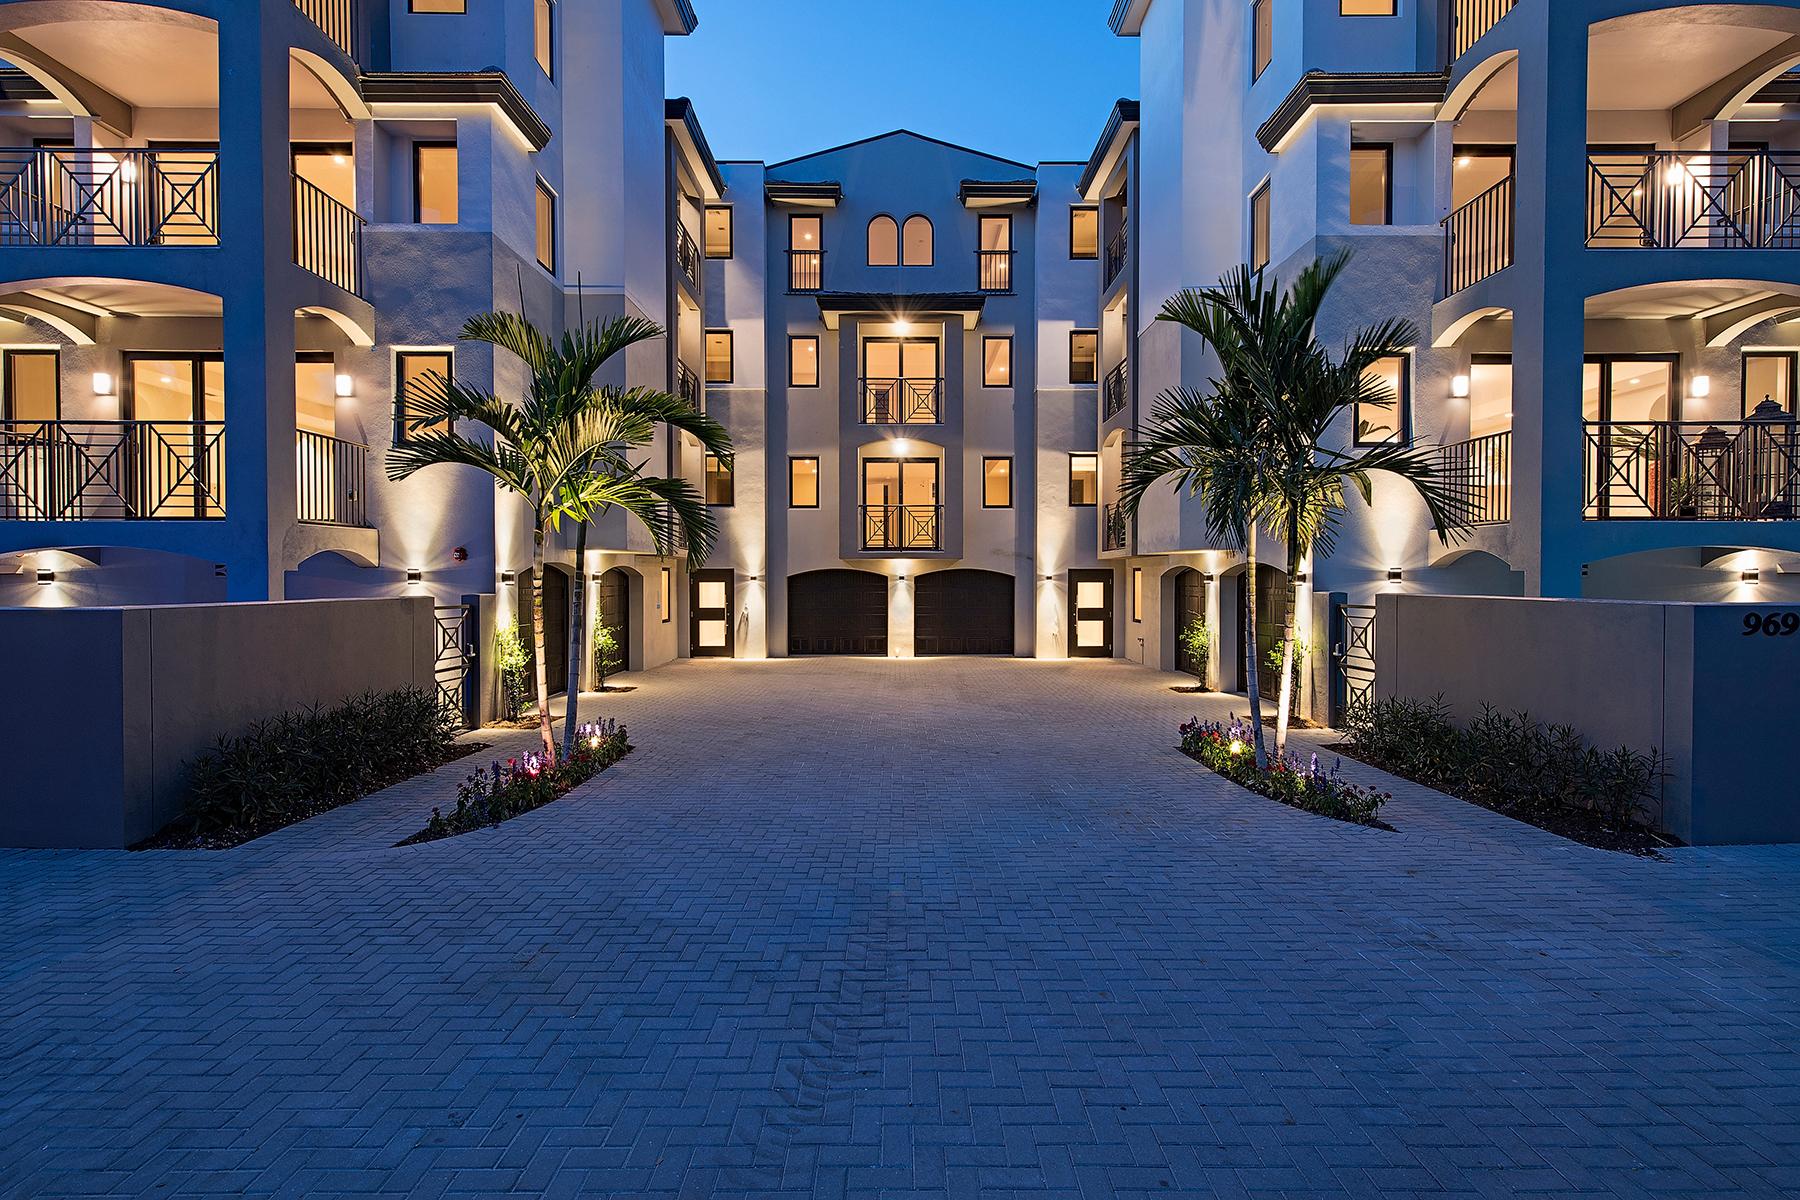 Condominium for Sale at OLD NAPLES - ESMERALDA ON EIGHTH 985 8th Ave S 102, Naples, Florida 34102 United States